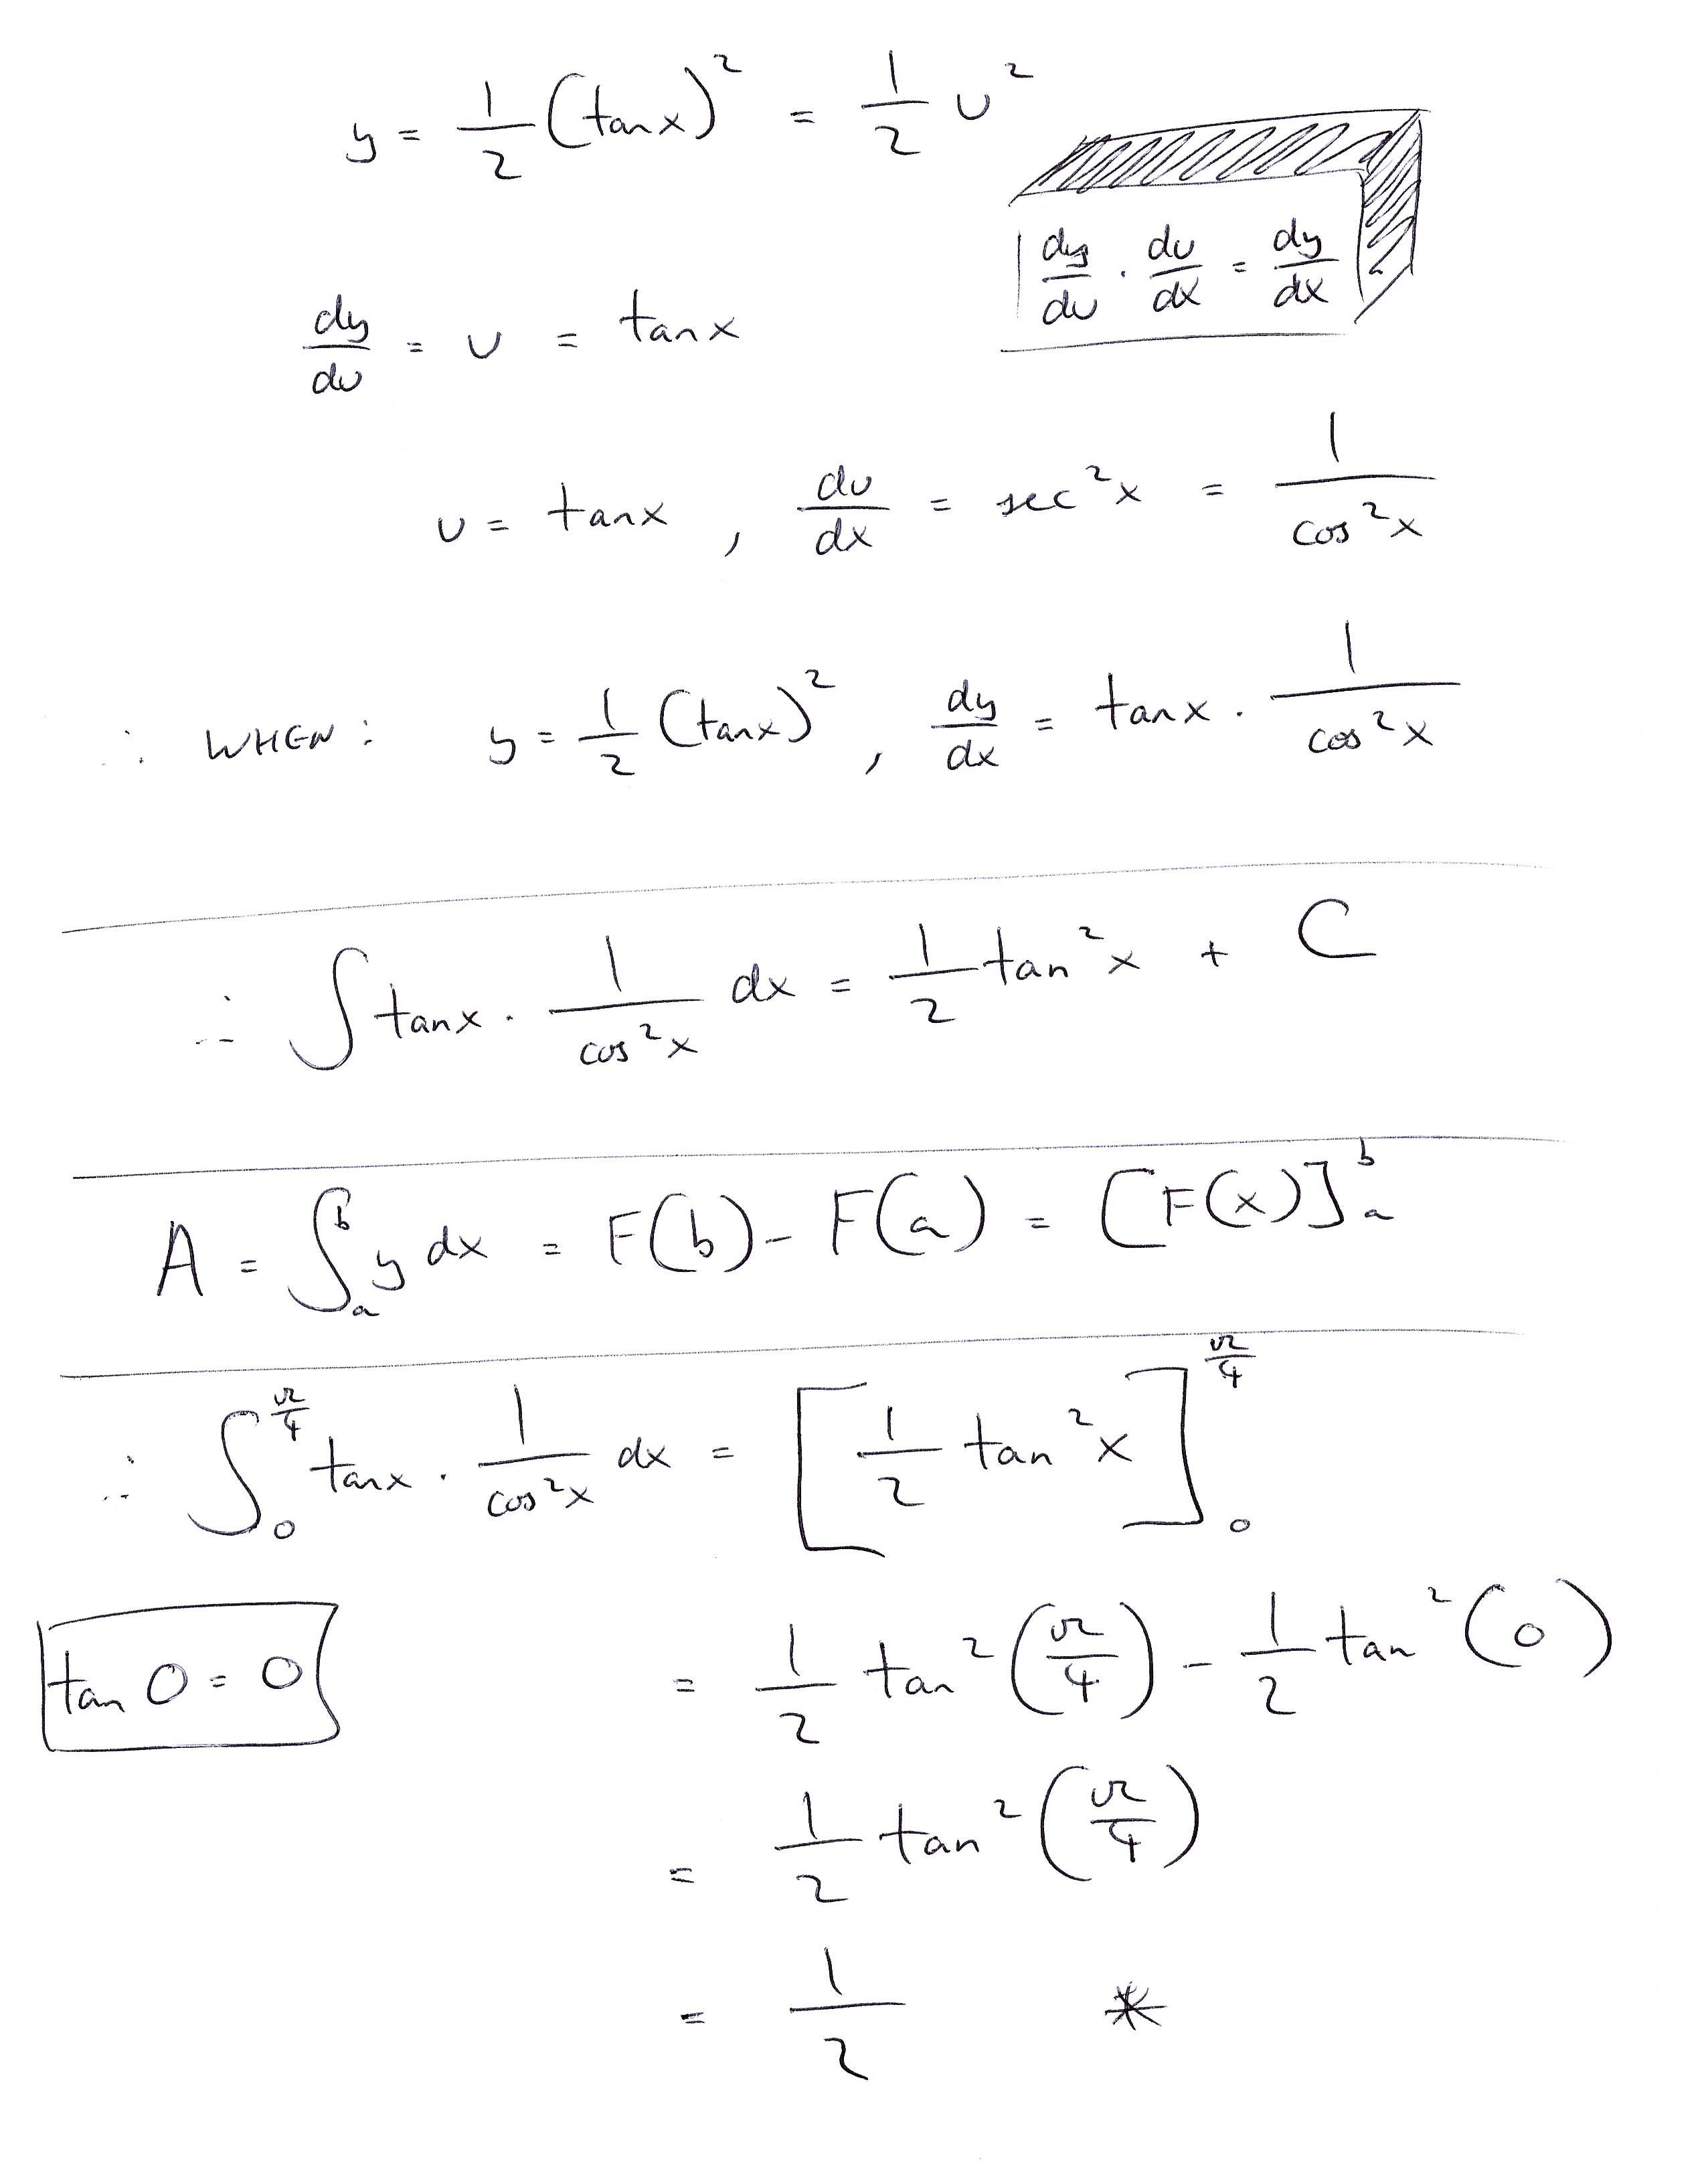 Calculus Problem Solved